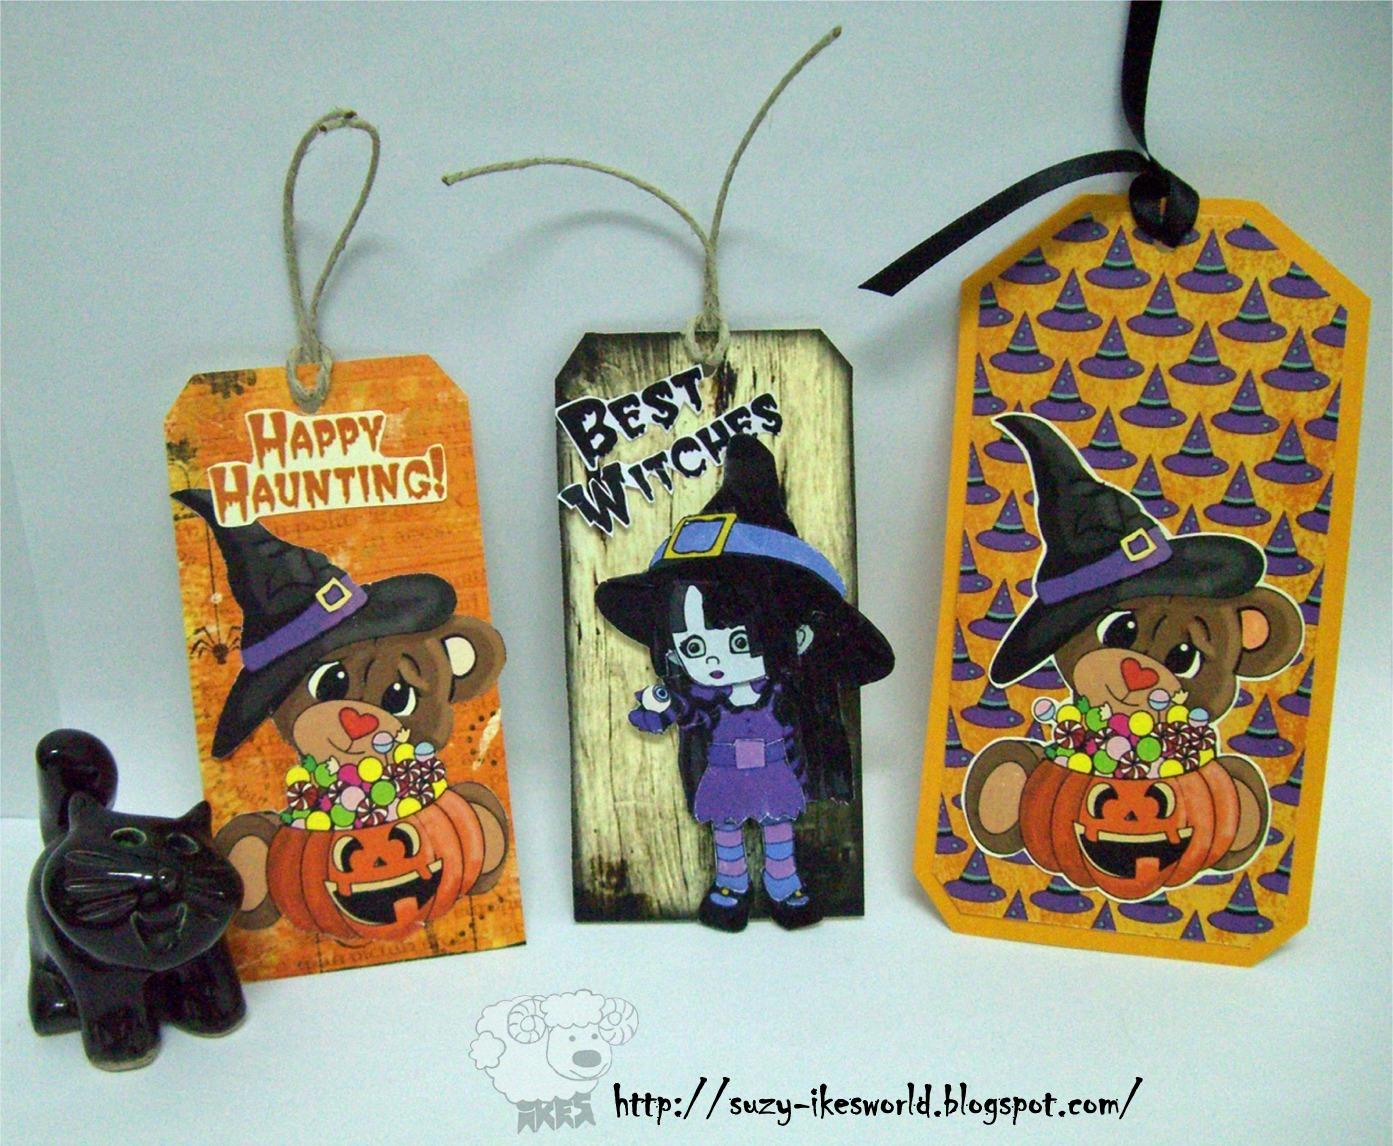 Ikes World: 31 DAYS OF HALLOWEEN DAY 30 - World Halloween Day